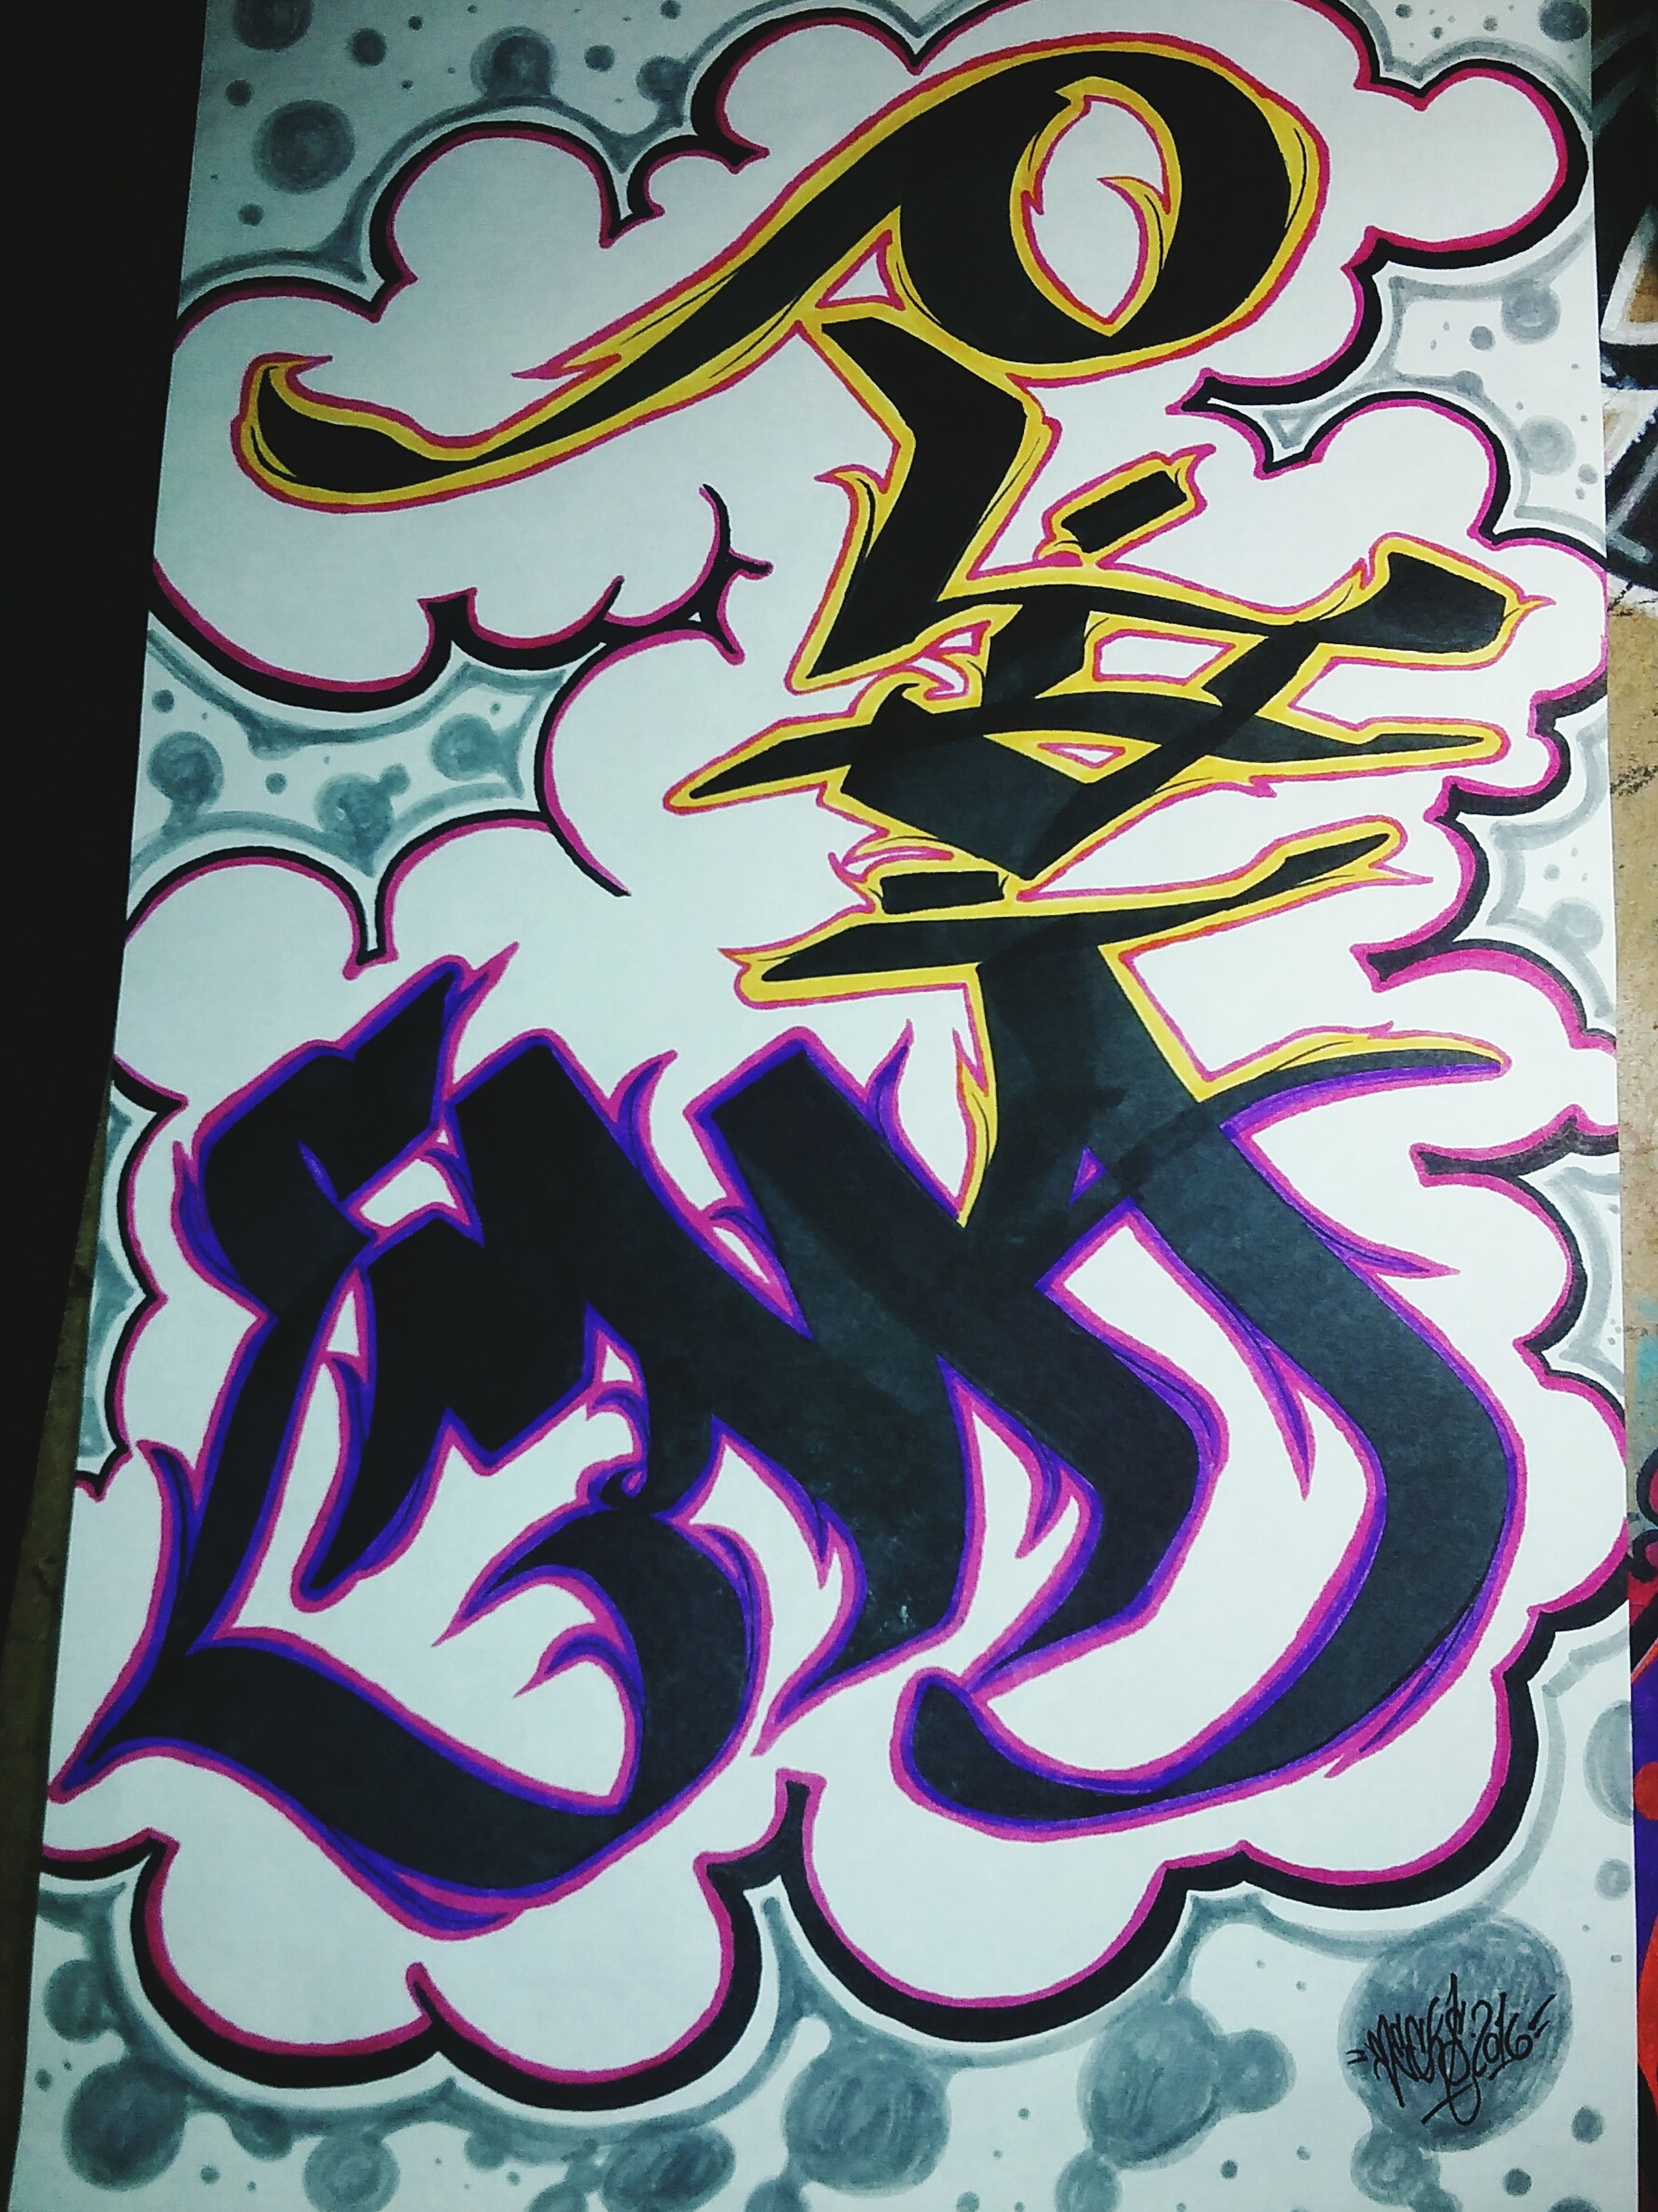 Olivia,Emma Graffiti Typography Sketchbook Graffiti Art Art, Drawing, Creativity Graffitiporn Graffiti Writers Mecks1 562 Long Beach California Lettering Graffiti Blackbook Playa Larga Type Art Artsy LBC Check This Out Typographyinspired Copicwide